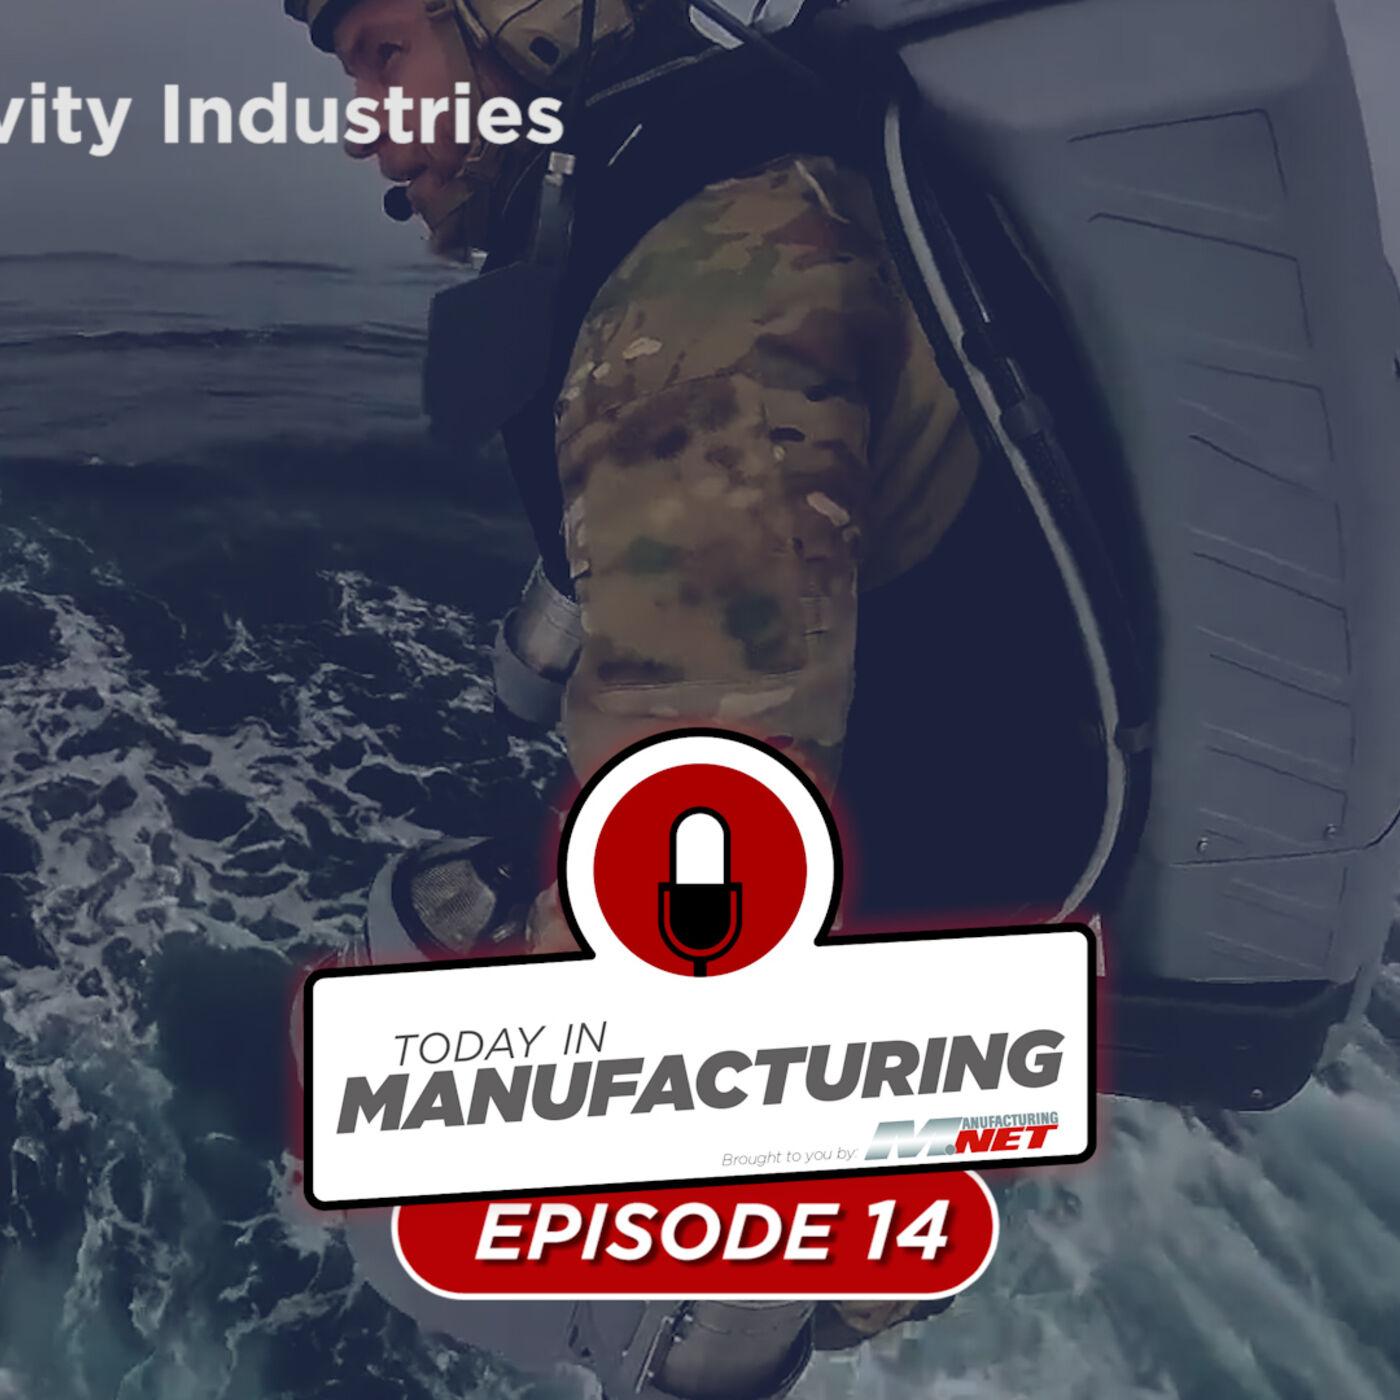 Jet Suit Impresses, Screw Causes Ship Crash, Tesla Solves Hate Crime | Today in Manufacturing Ep. 14